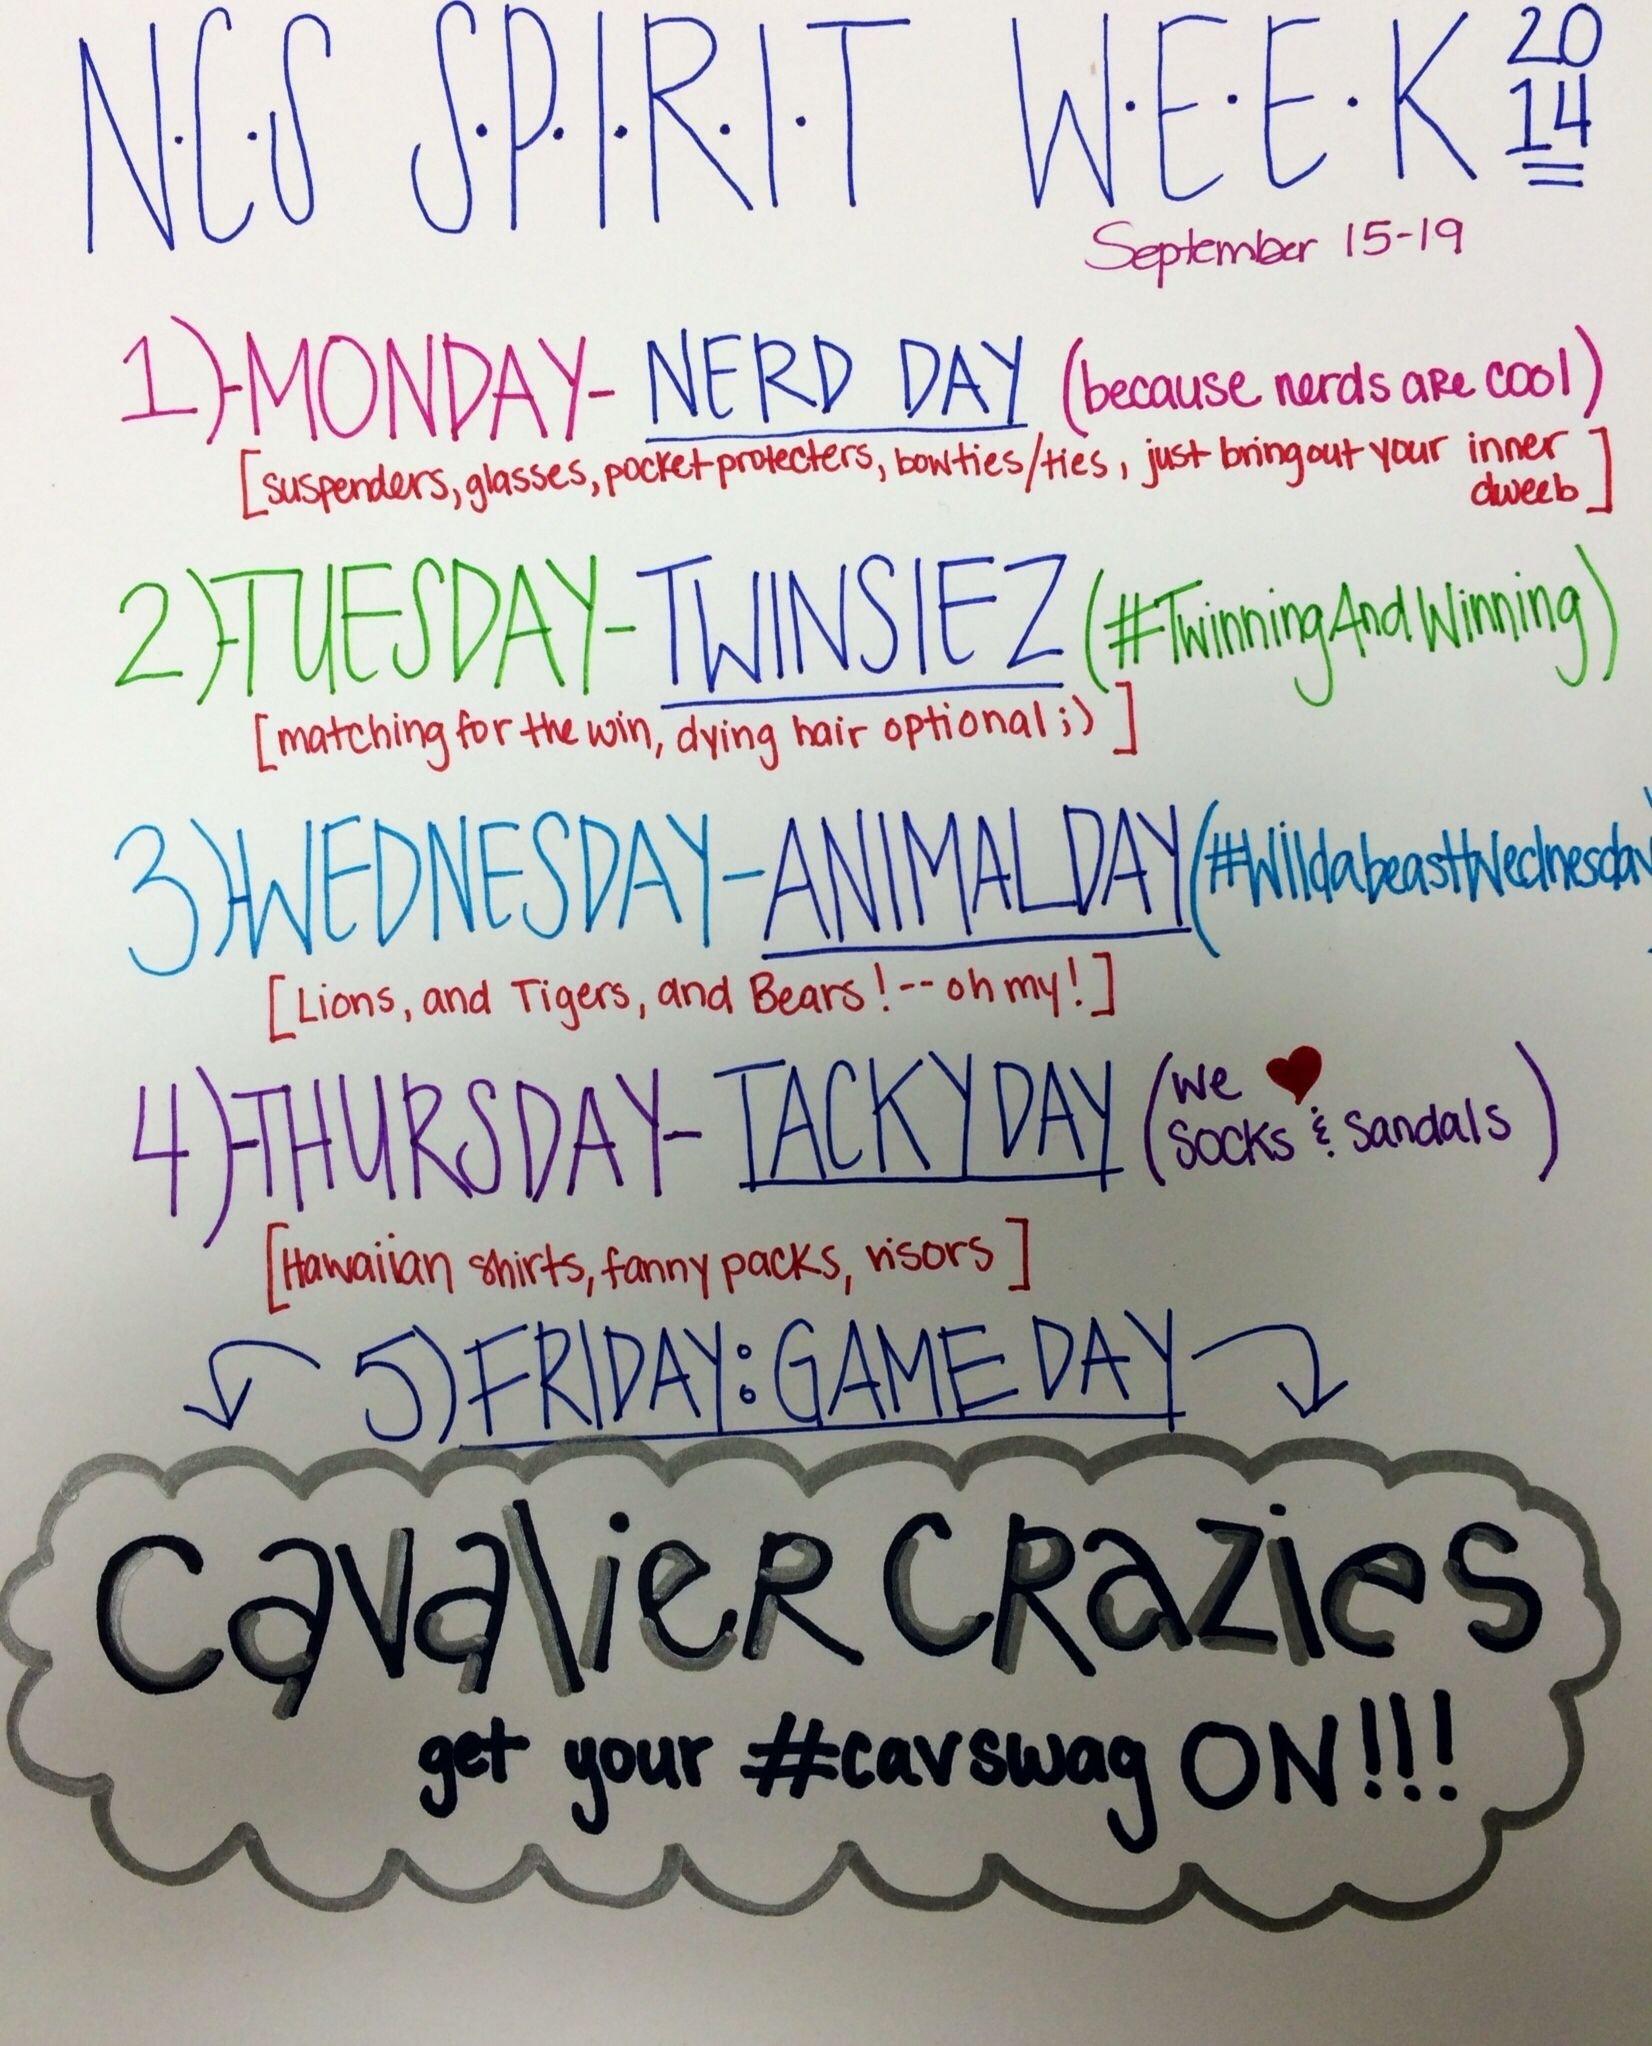 10 Most Recommended Spirit Week Ideas For Elementary School image result for spirit week ideas spirit week pinterest 1